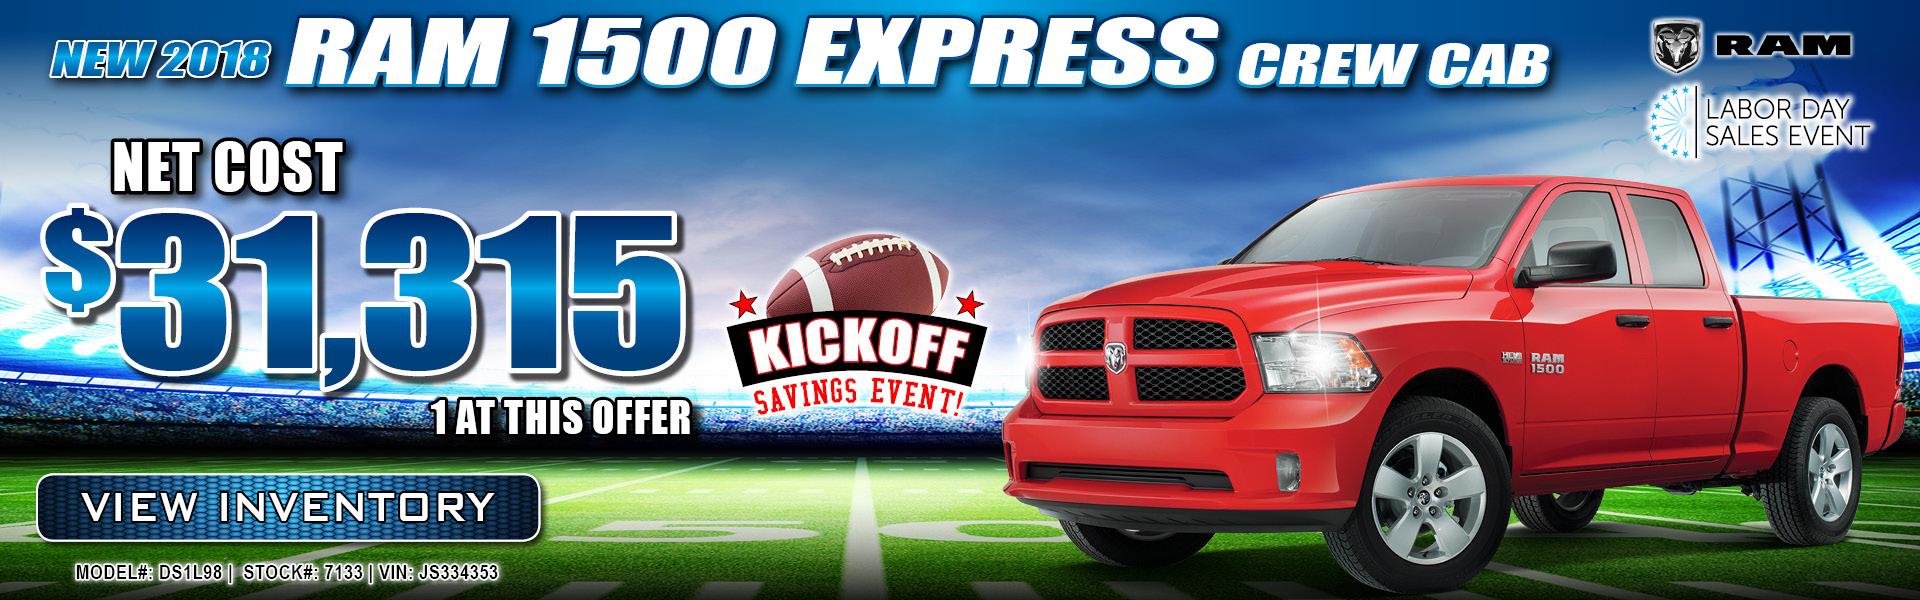 Ram 1500 Express $31,315